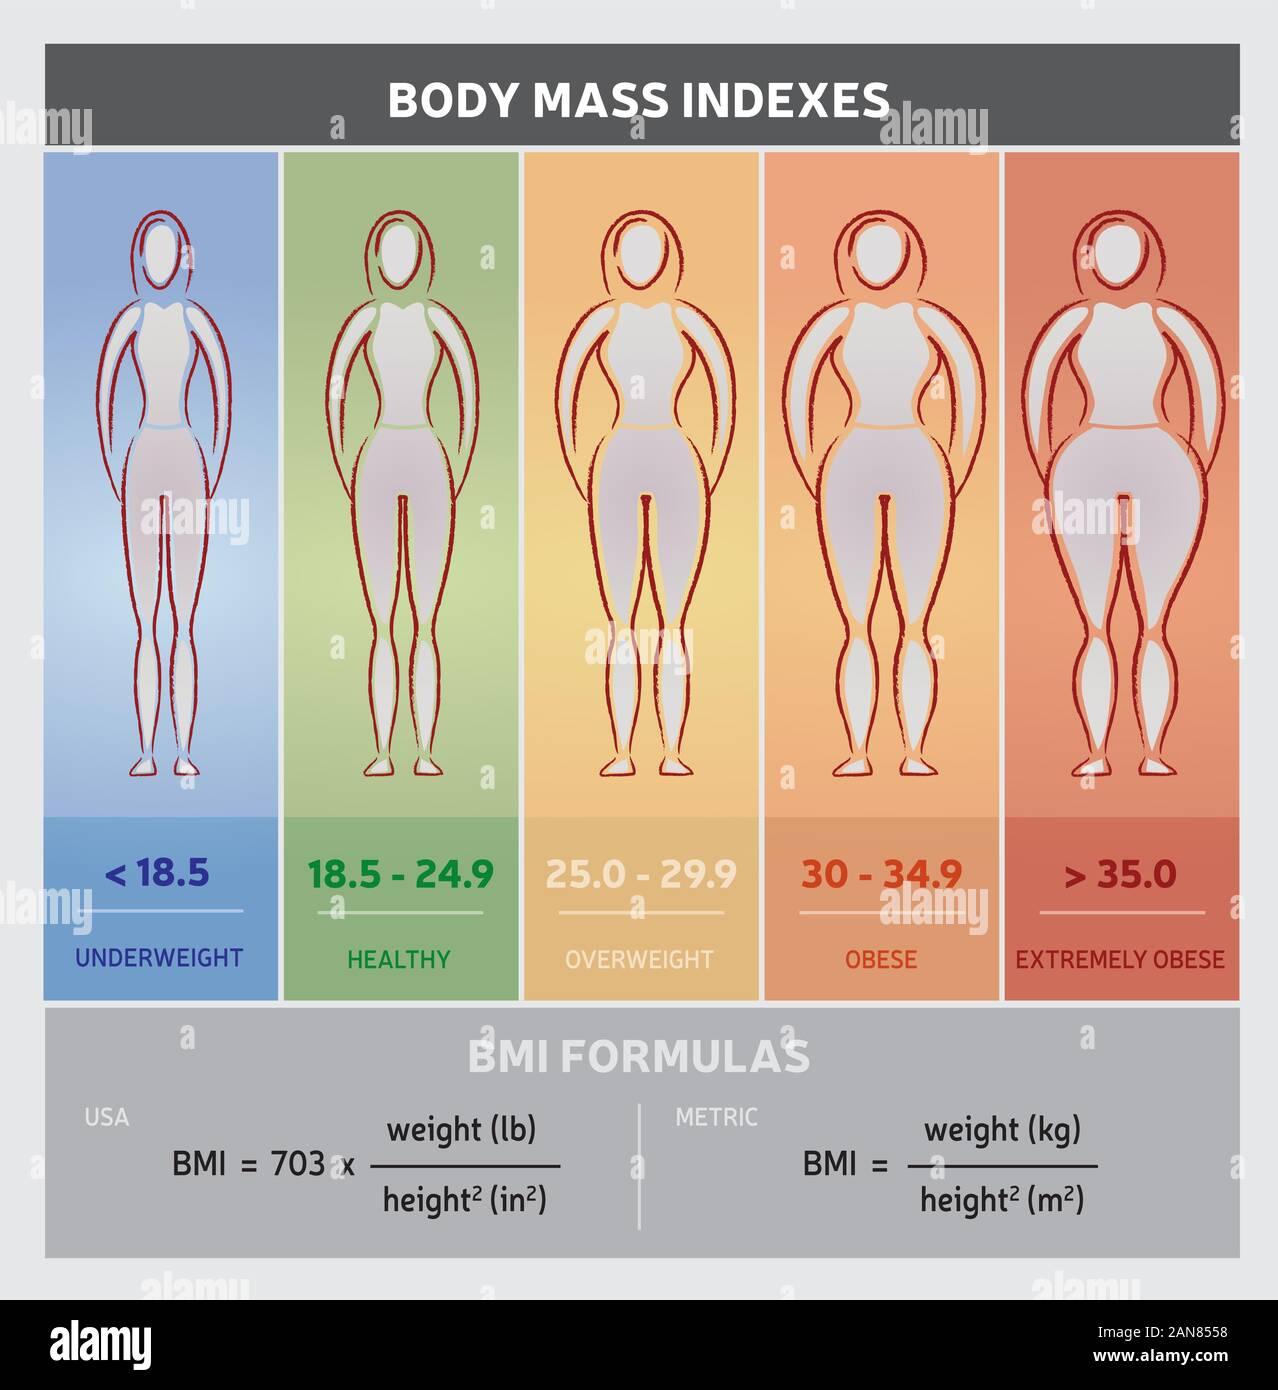 27 5 frau bmi Normal Weight